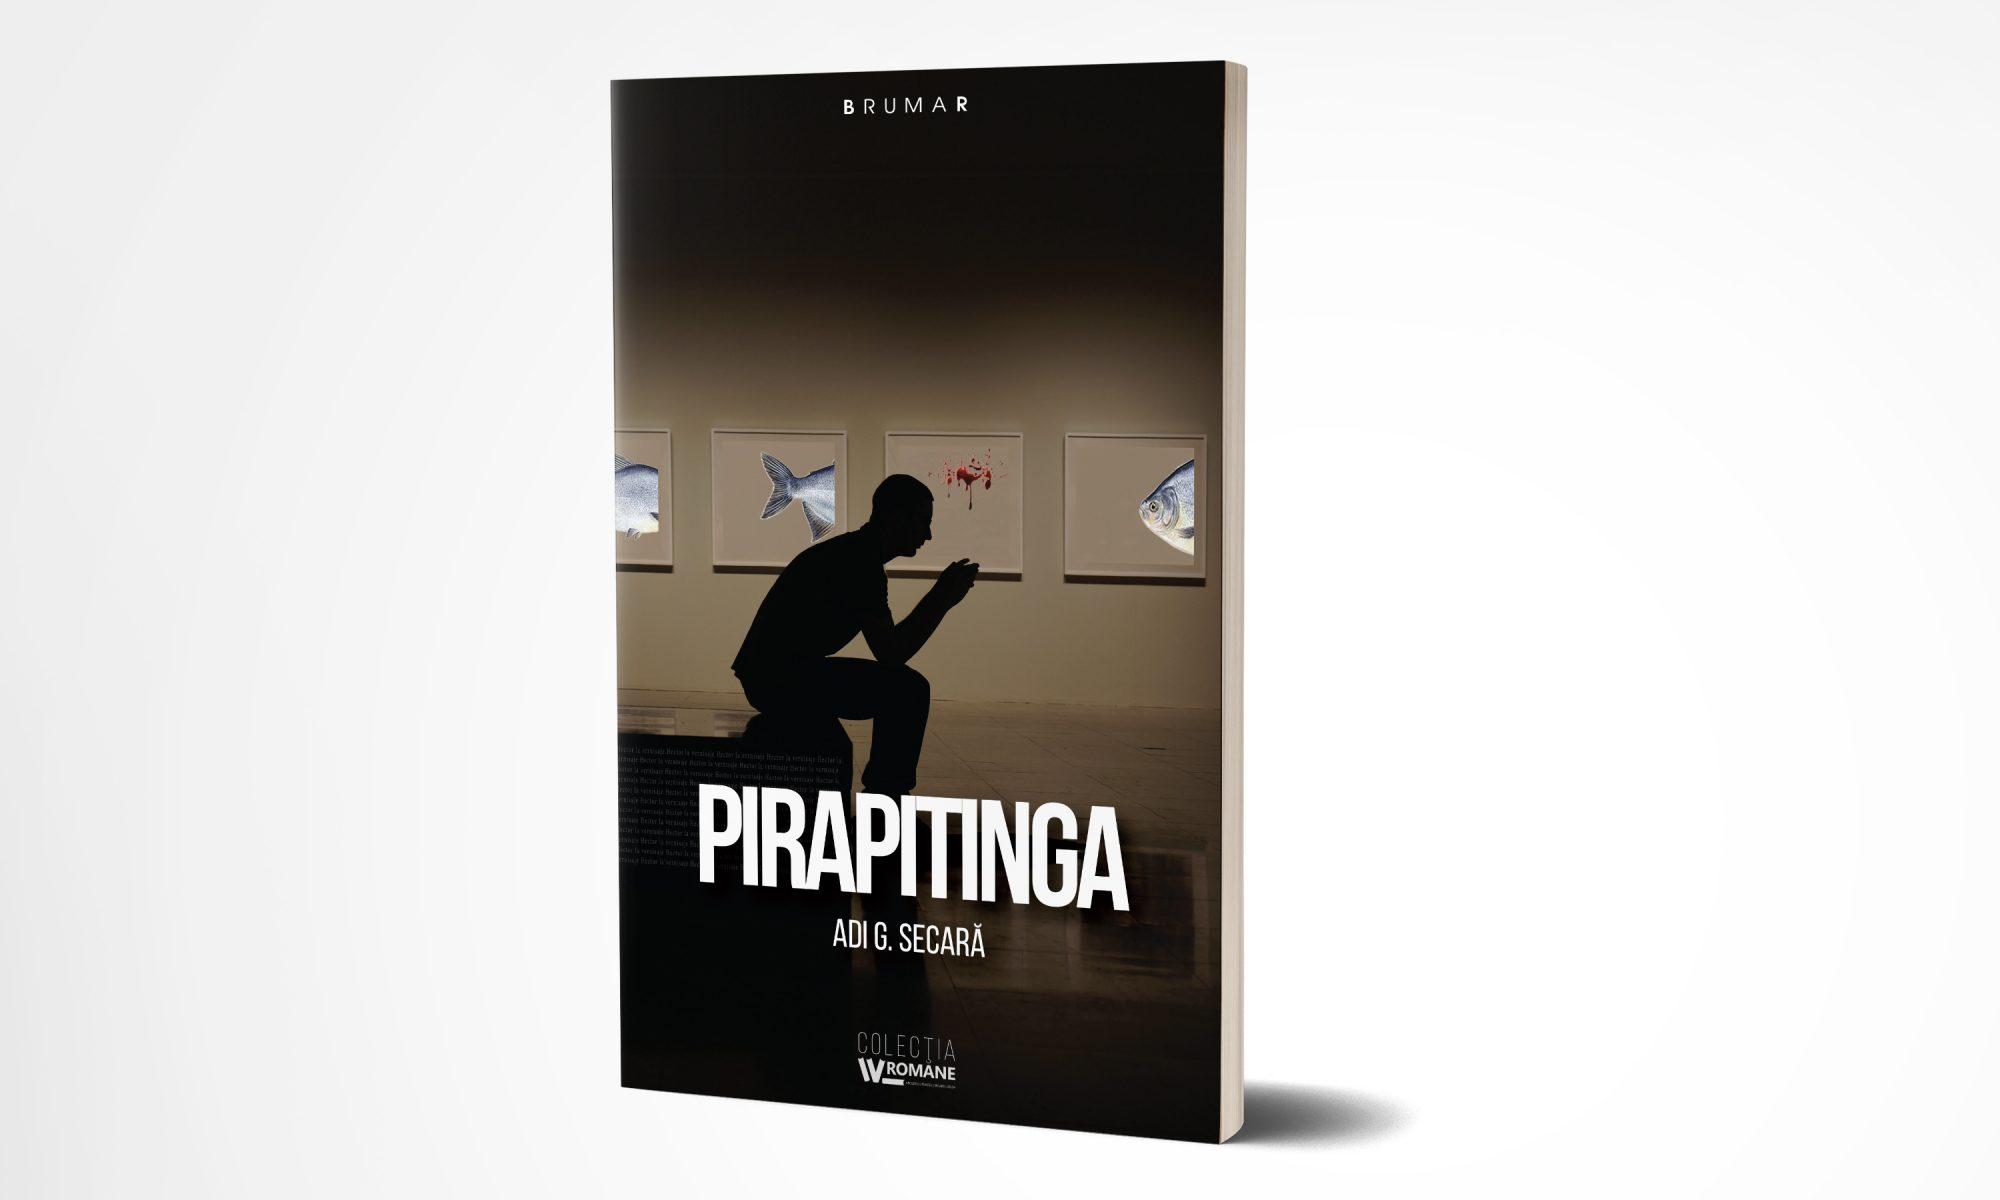 Adi Secara - Pirapitinga_C1